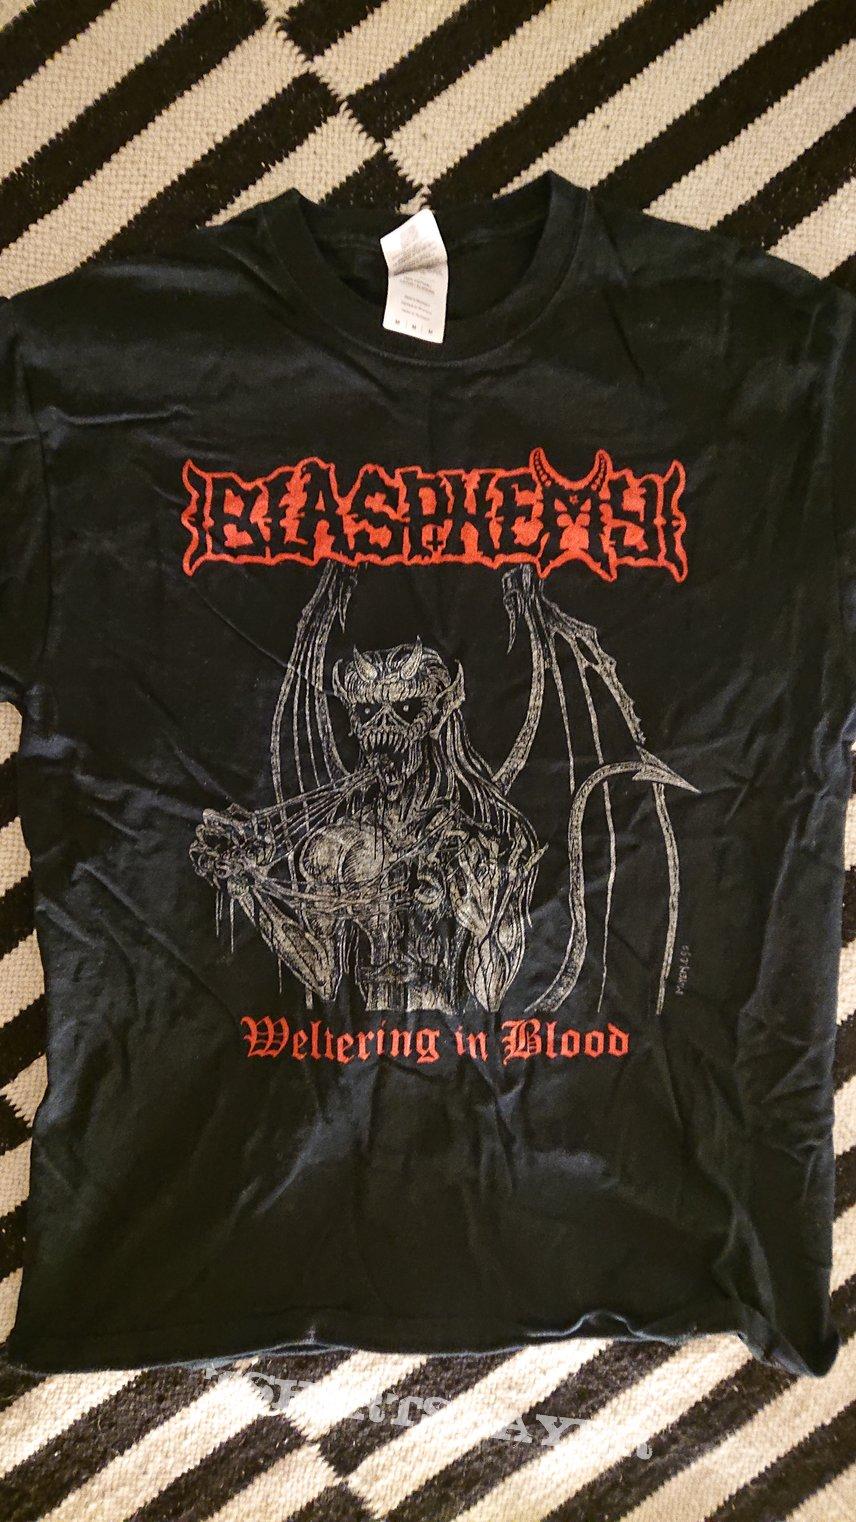 Blasphemy - Weltering in Blood T-shirt